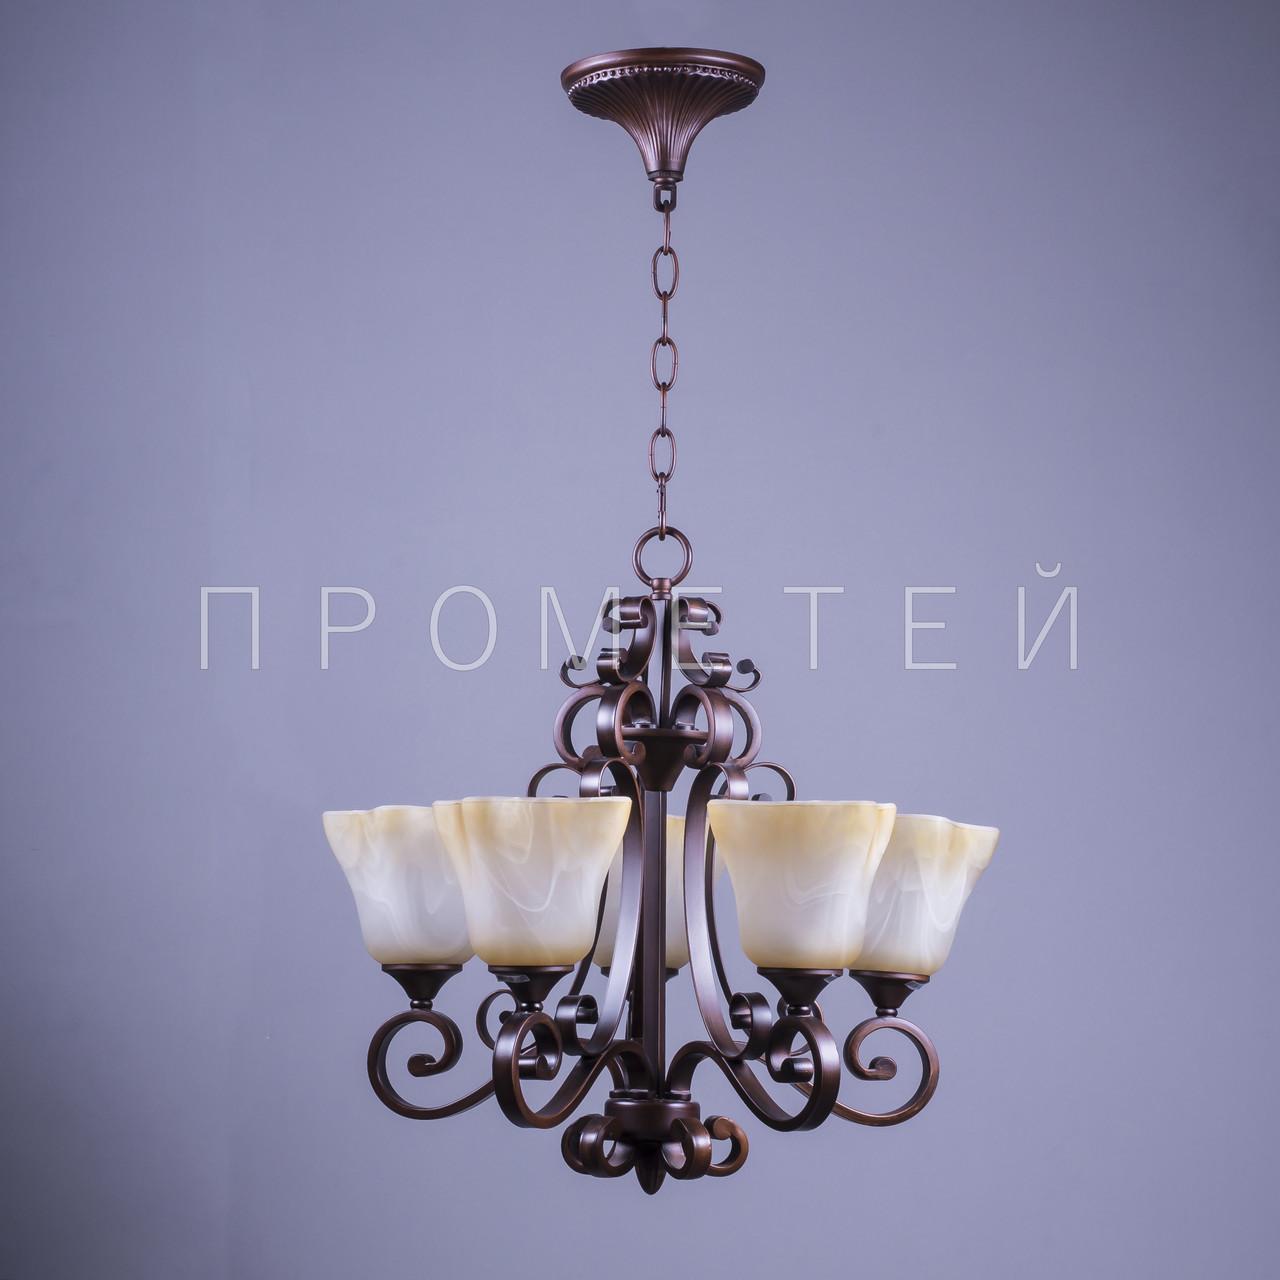 Классическая люстра на цепи на 5 лампочек P3-3642/5/PG+YL